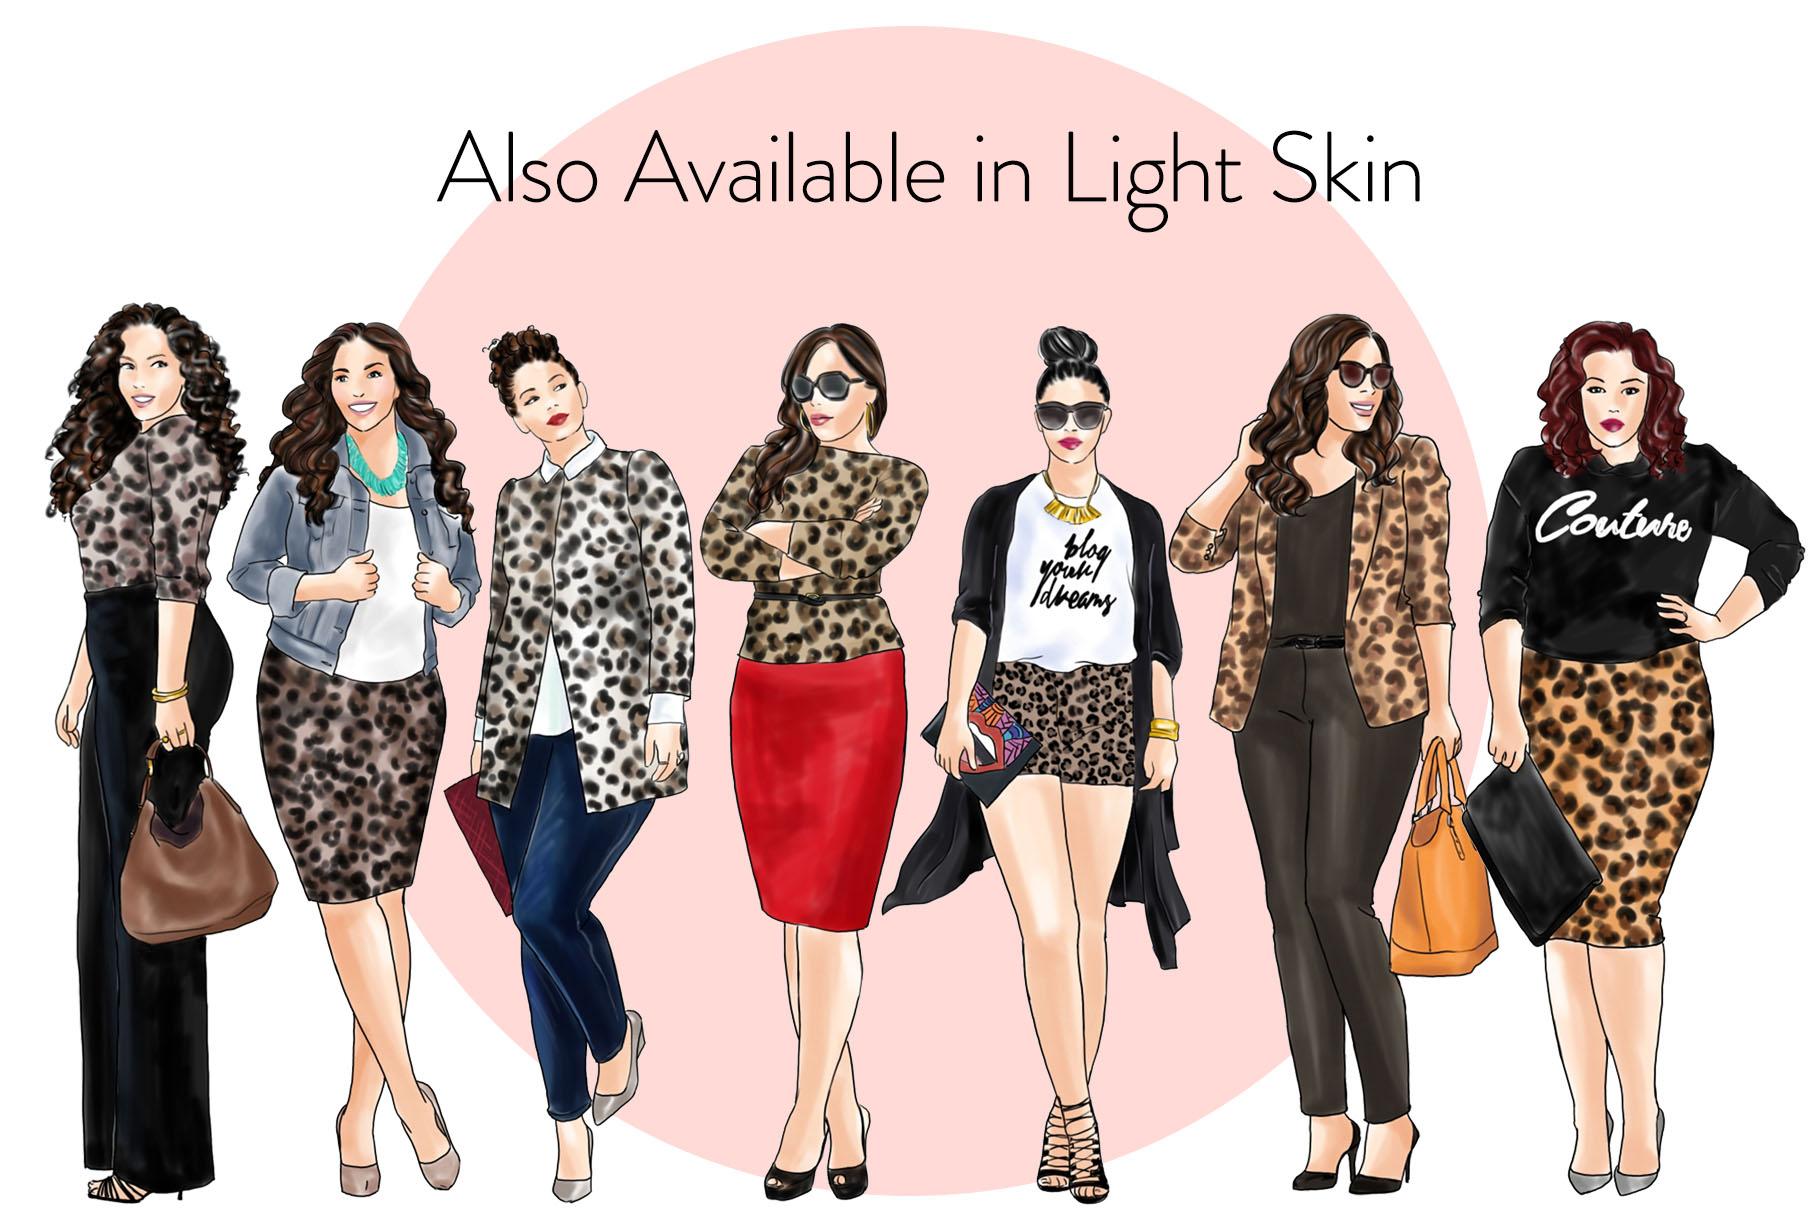 Fashion clipart - Curvy Girls in Animal Print - Dark Skin example image 4